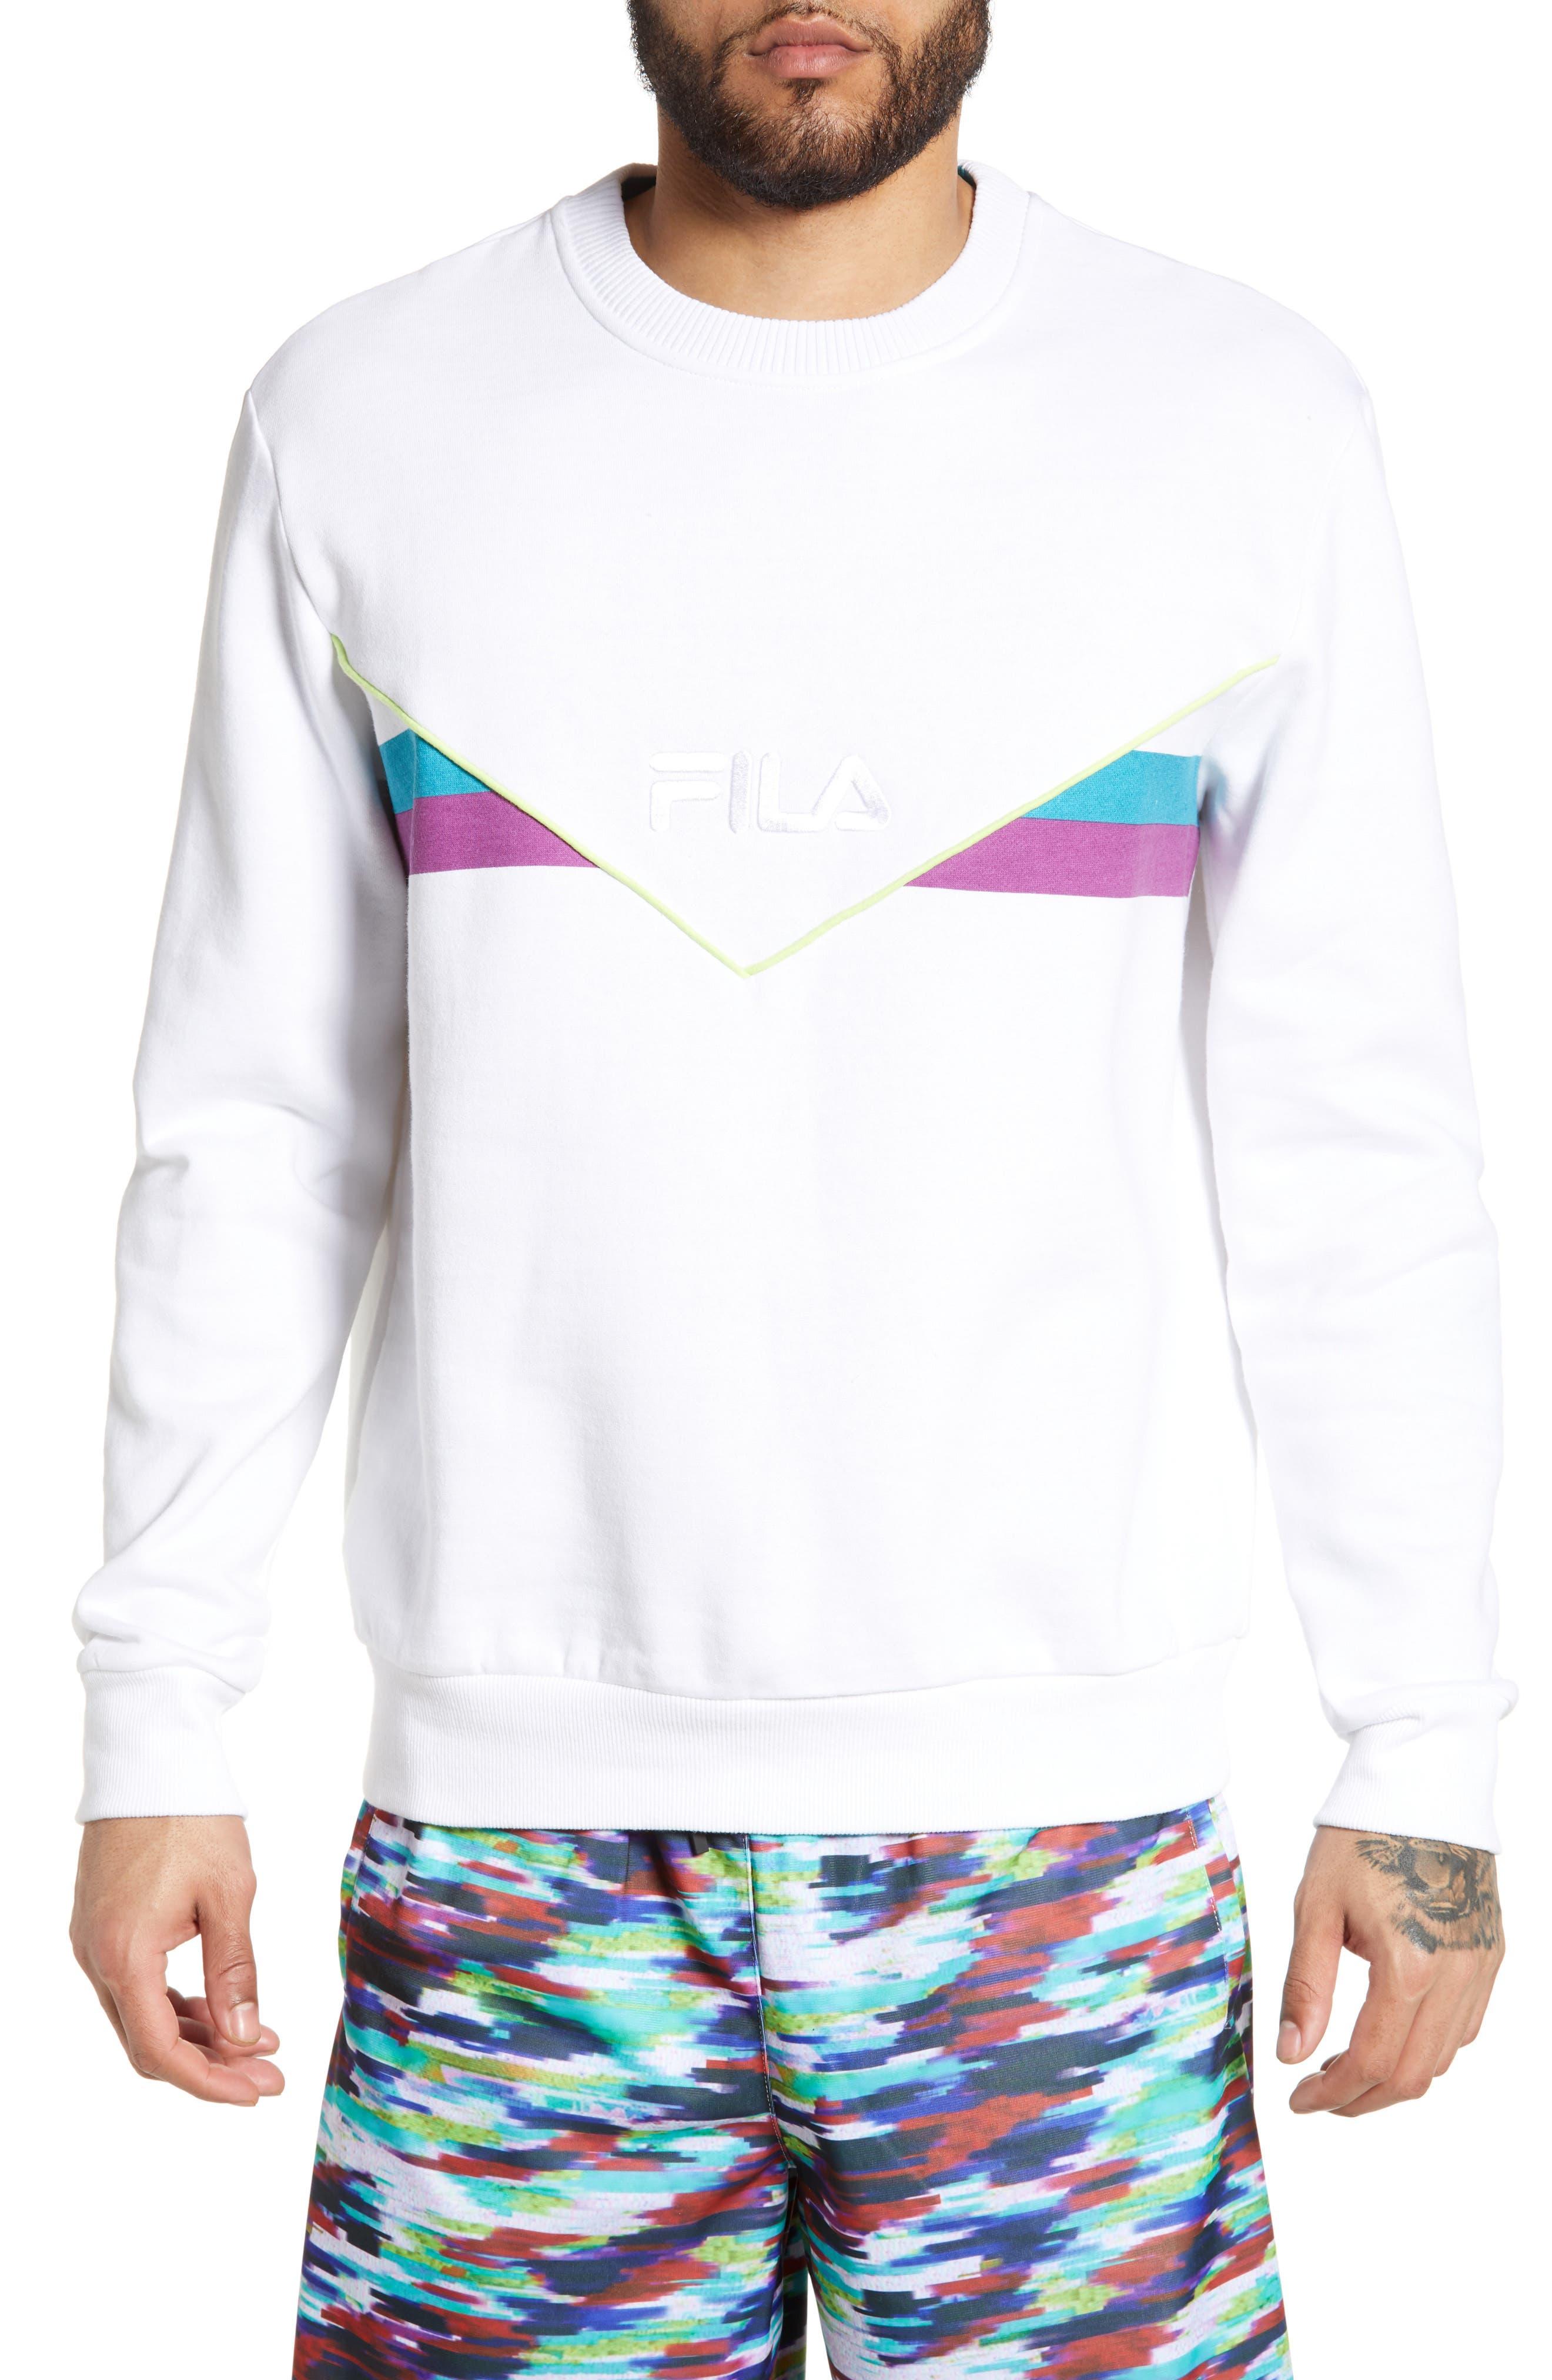 FILA, Leroy Chevron Sweatshirt, Main thumbnail 1, color, WHITE